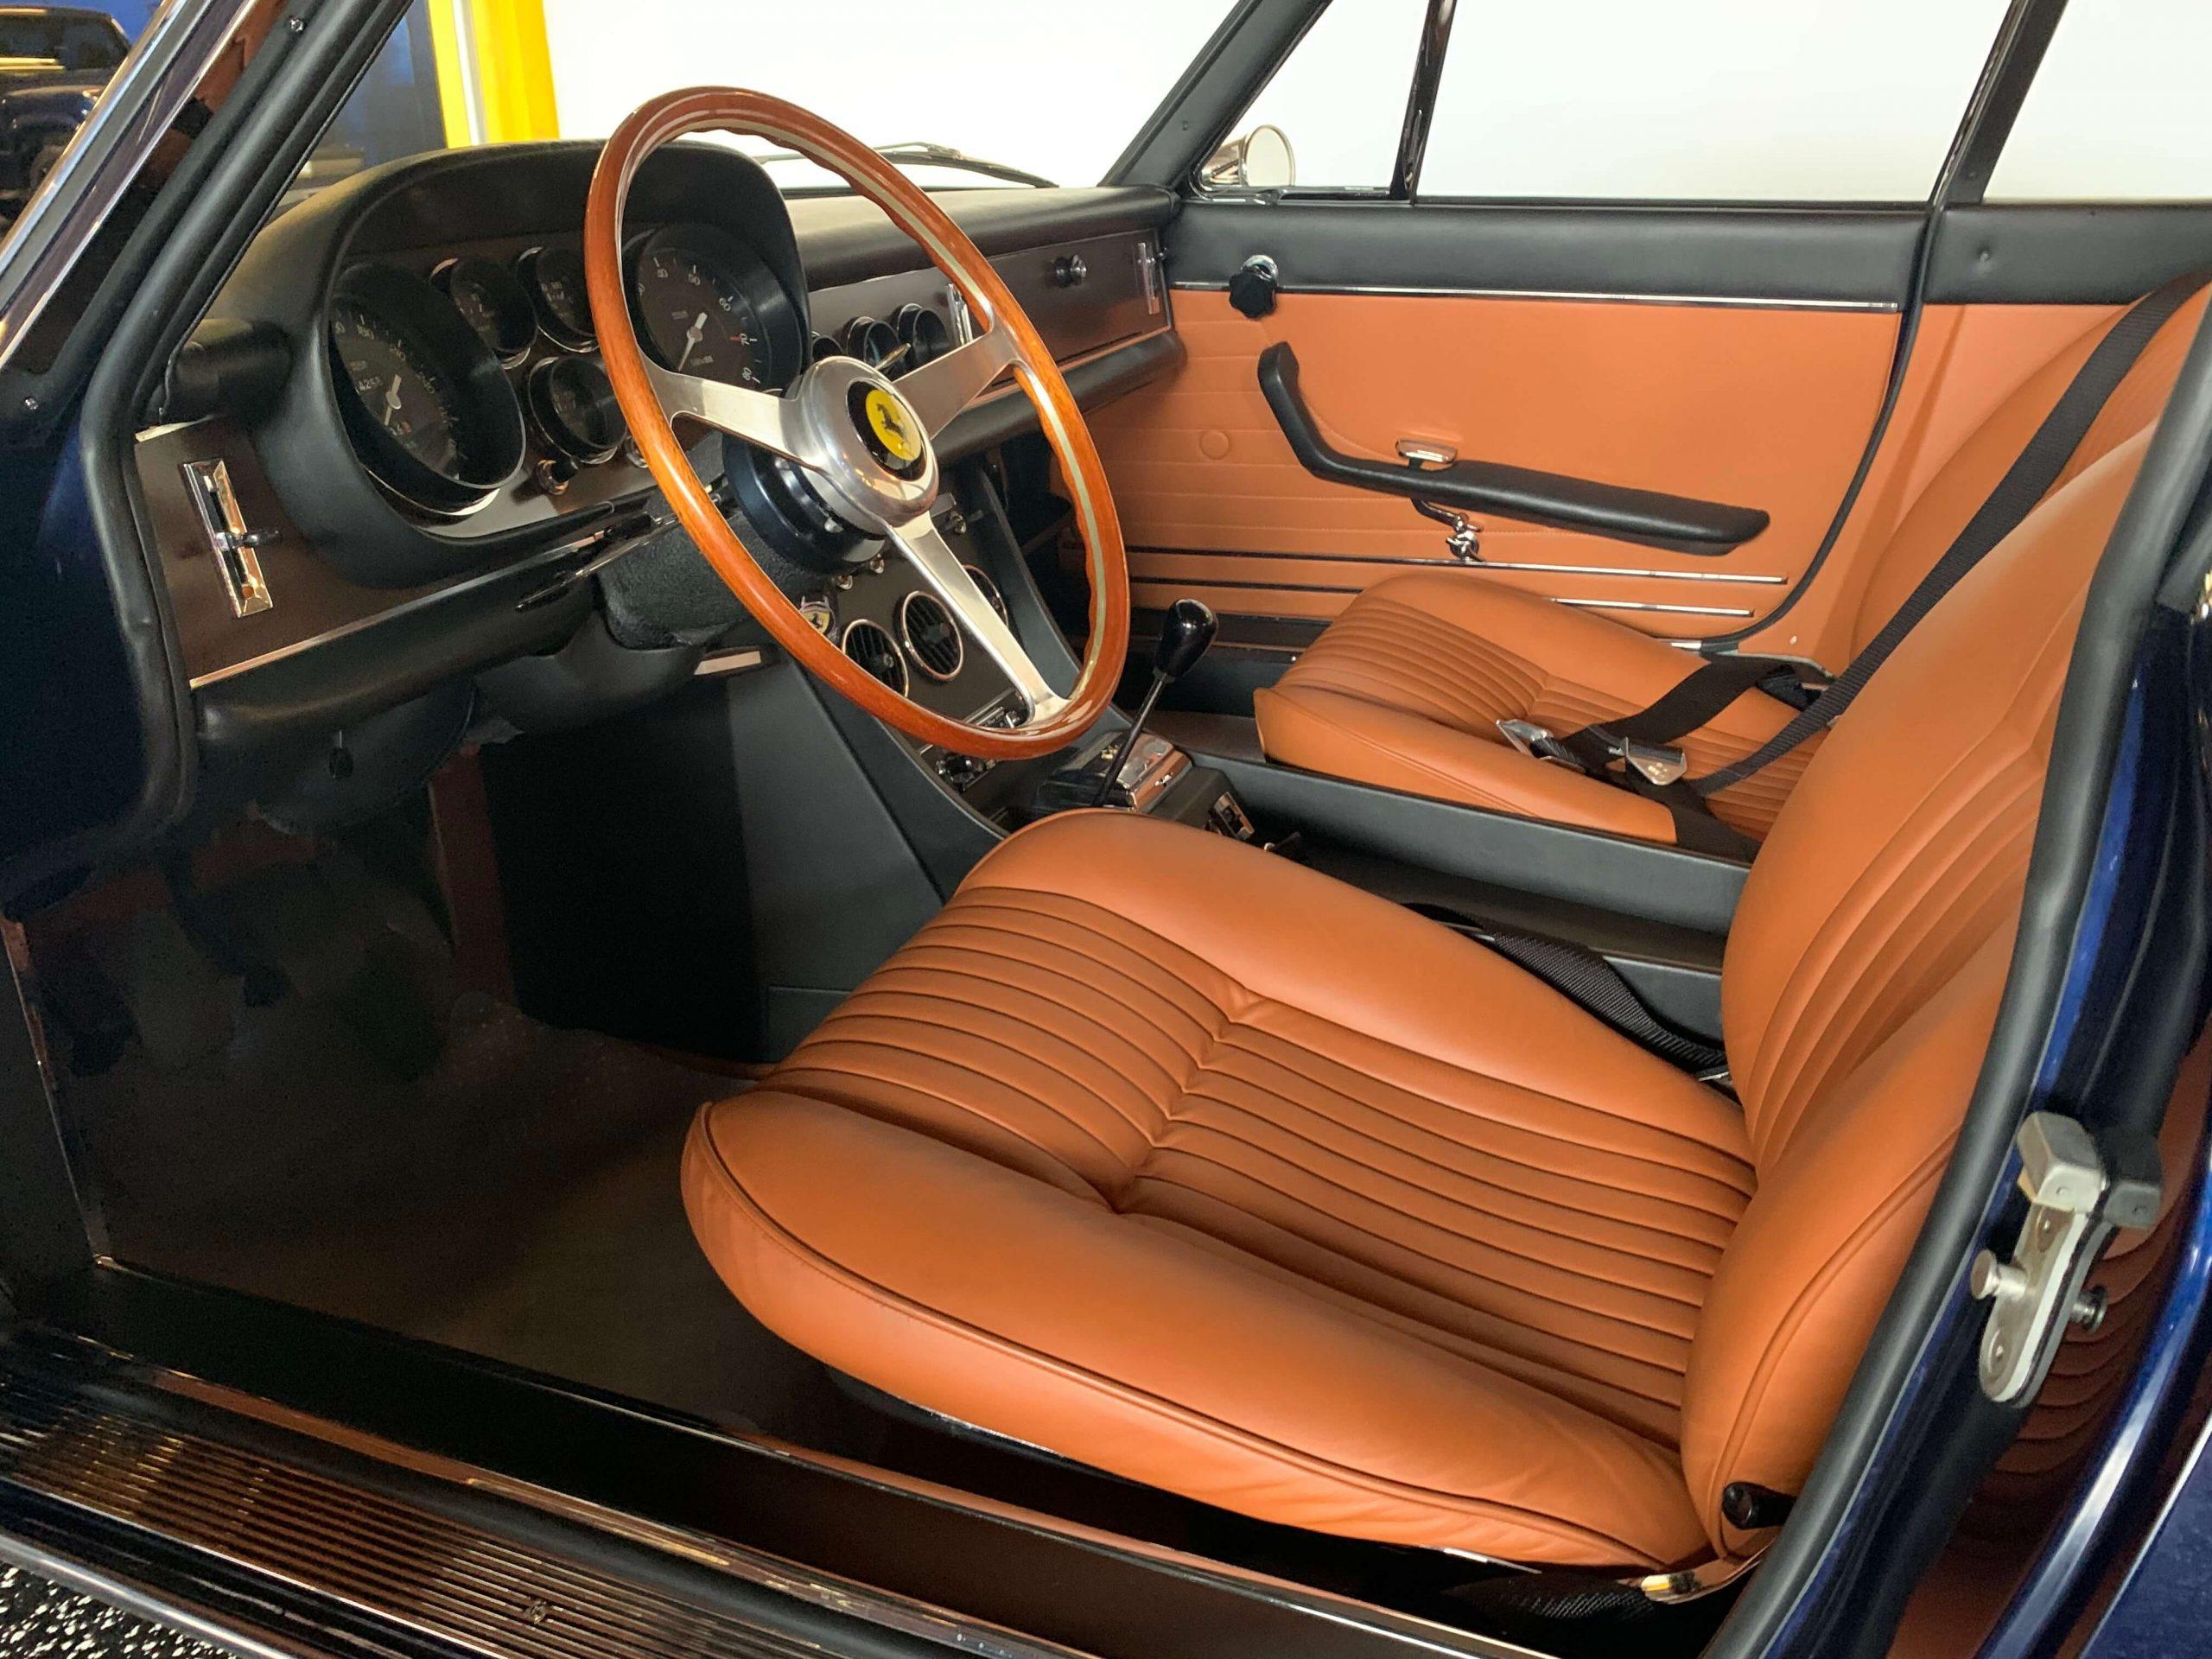 Ferrari 330 GTC Interior from left 2